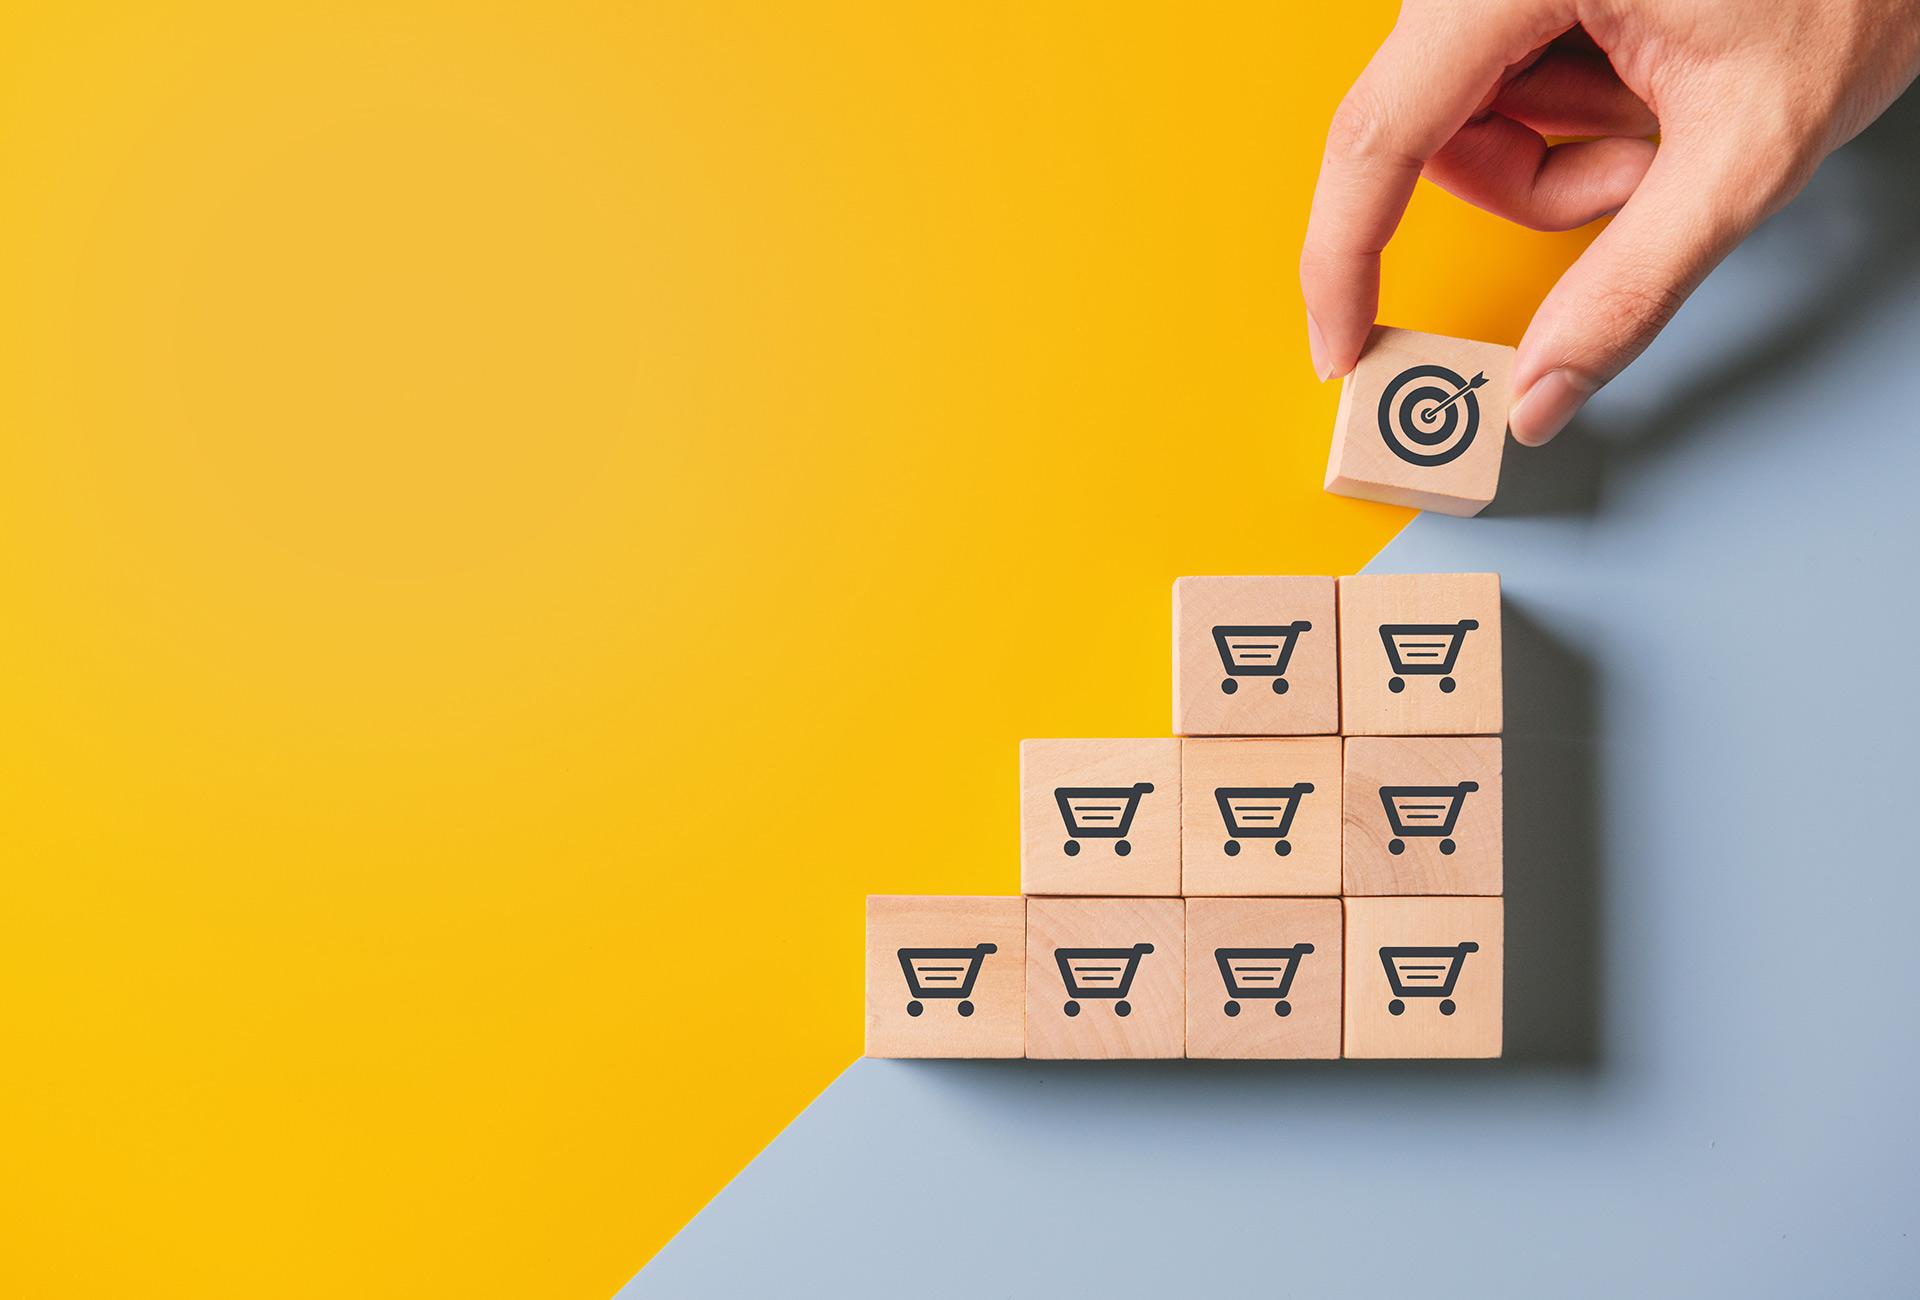 sitecore commerce quickstart